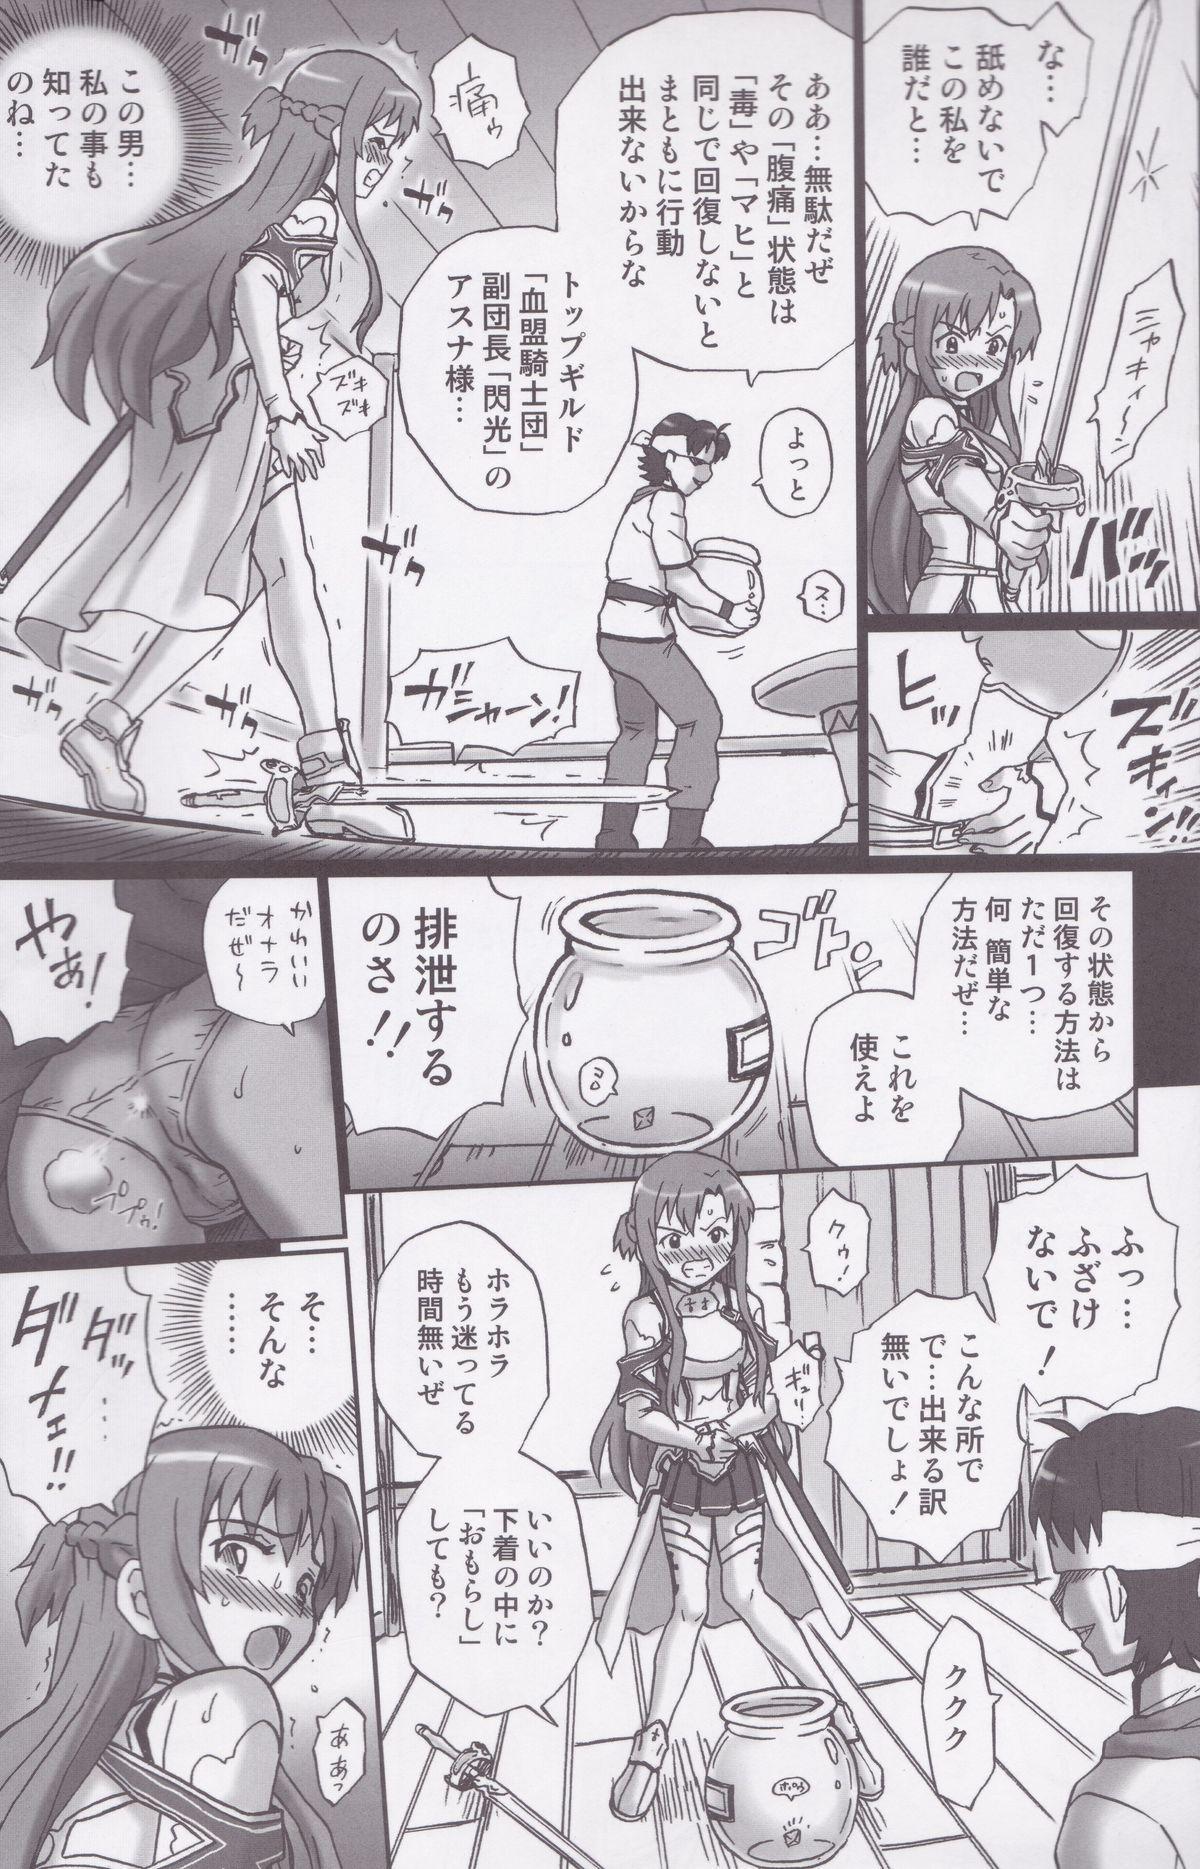 TAIL-MAN ASUNA BOOK 6